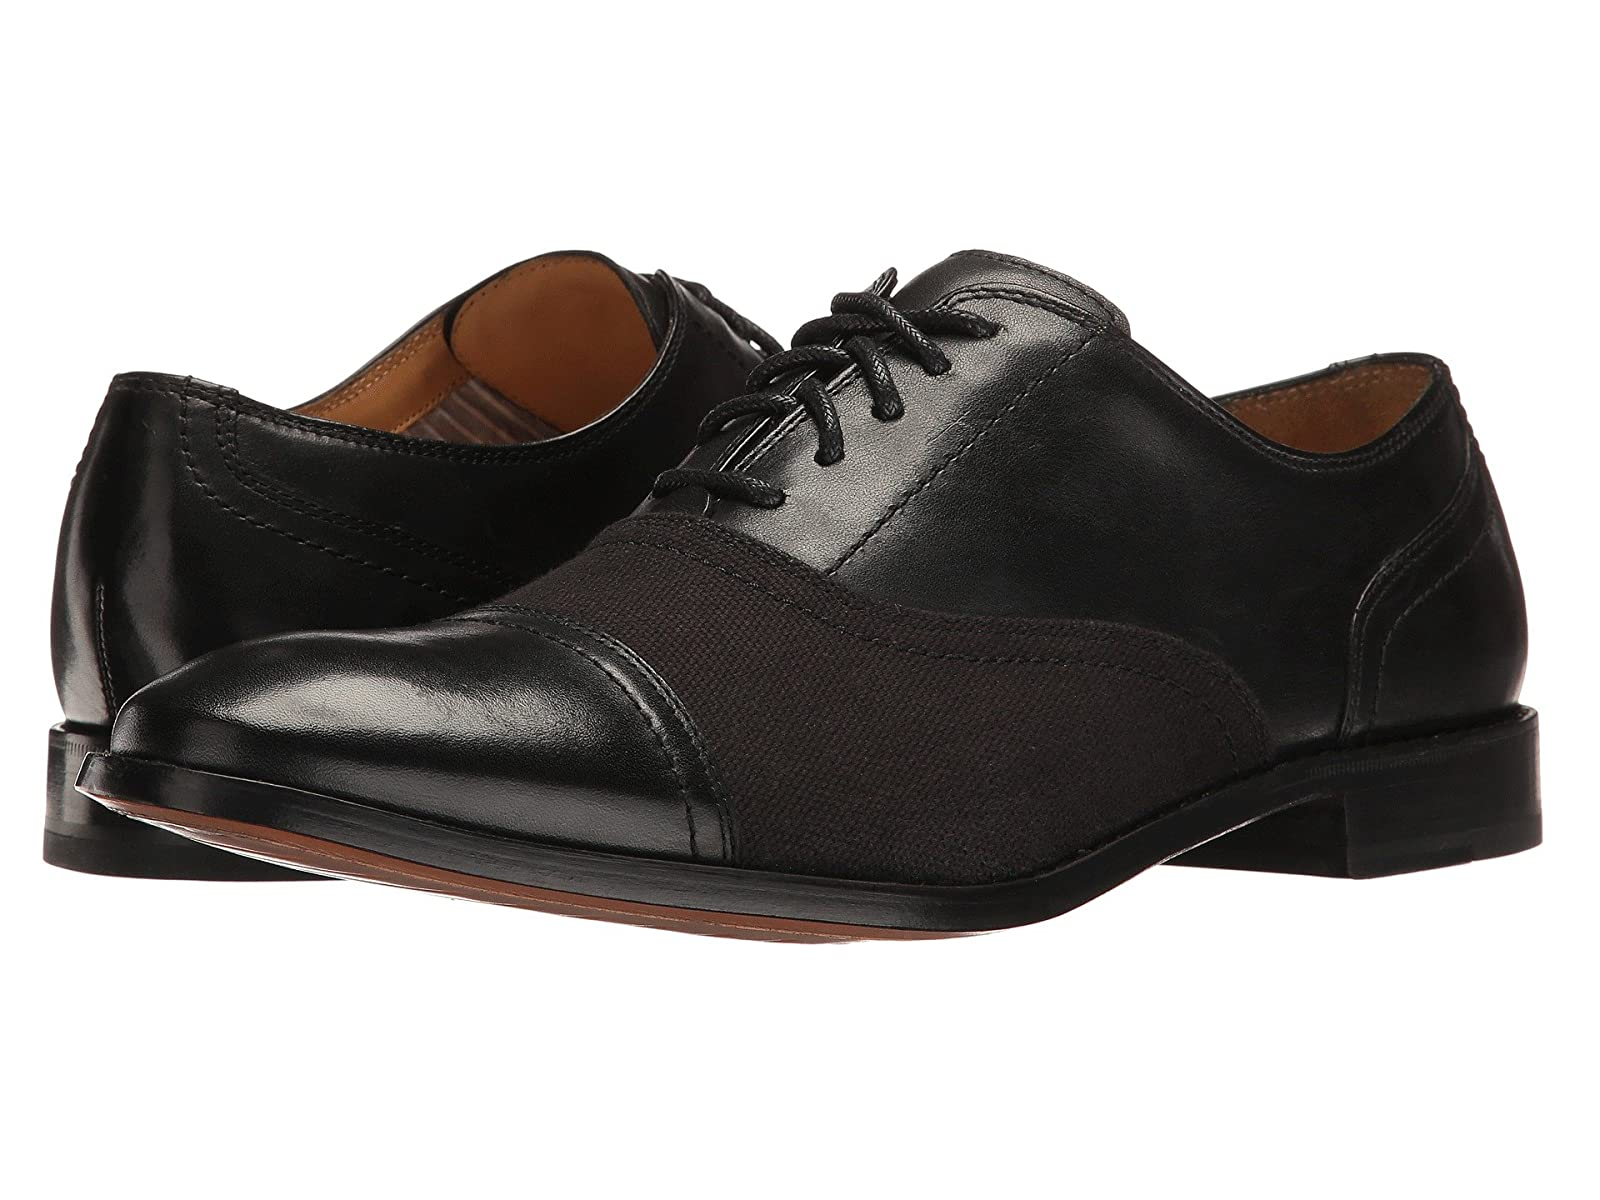 Michael Bastian Gray Label Caan Cap ToeCheap and distinctive eye-catching shoes